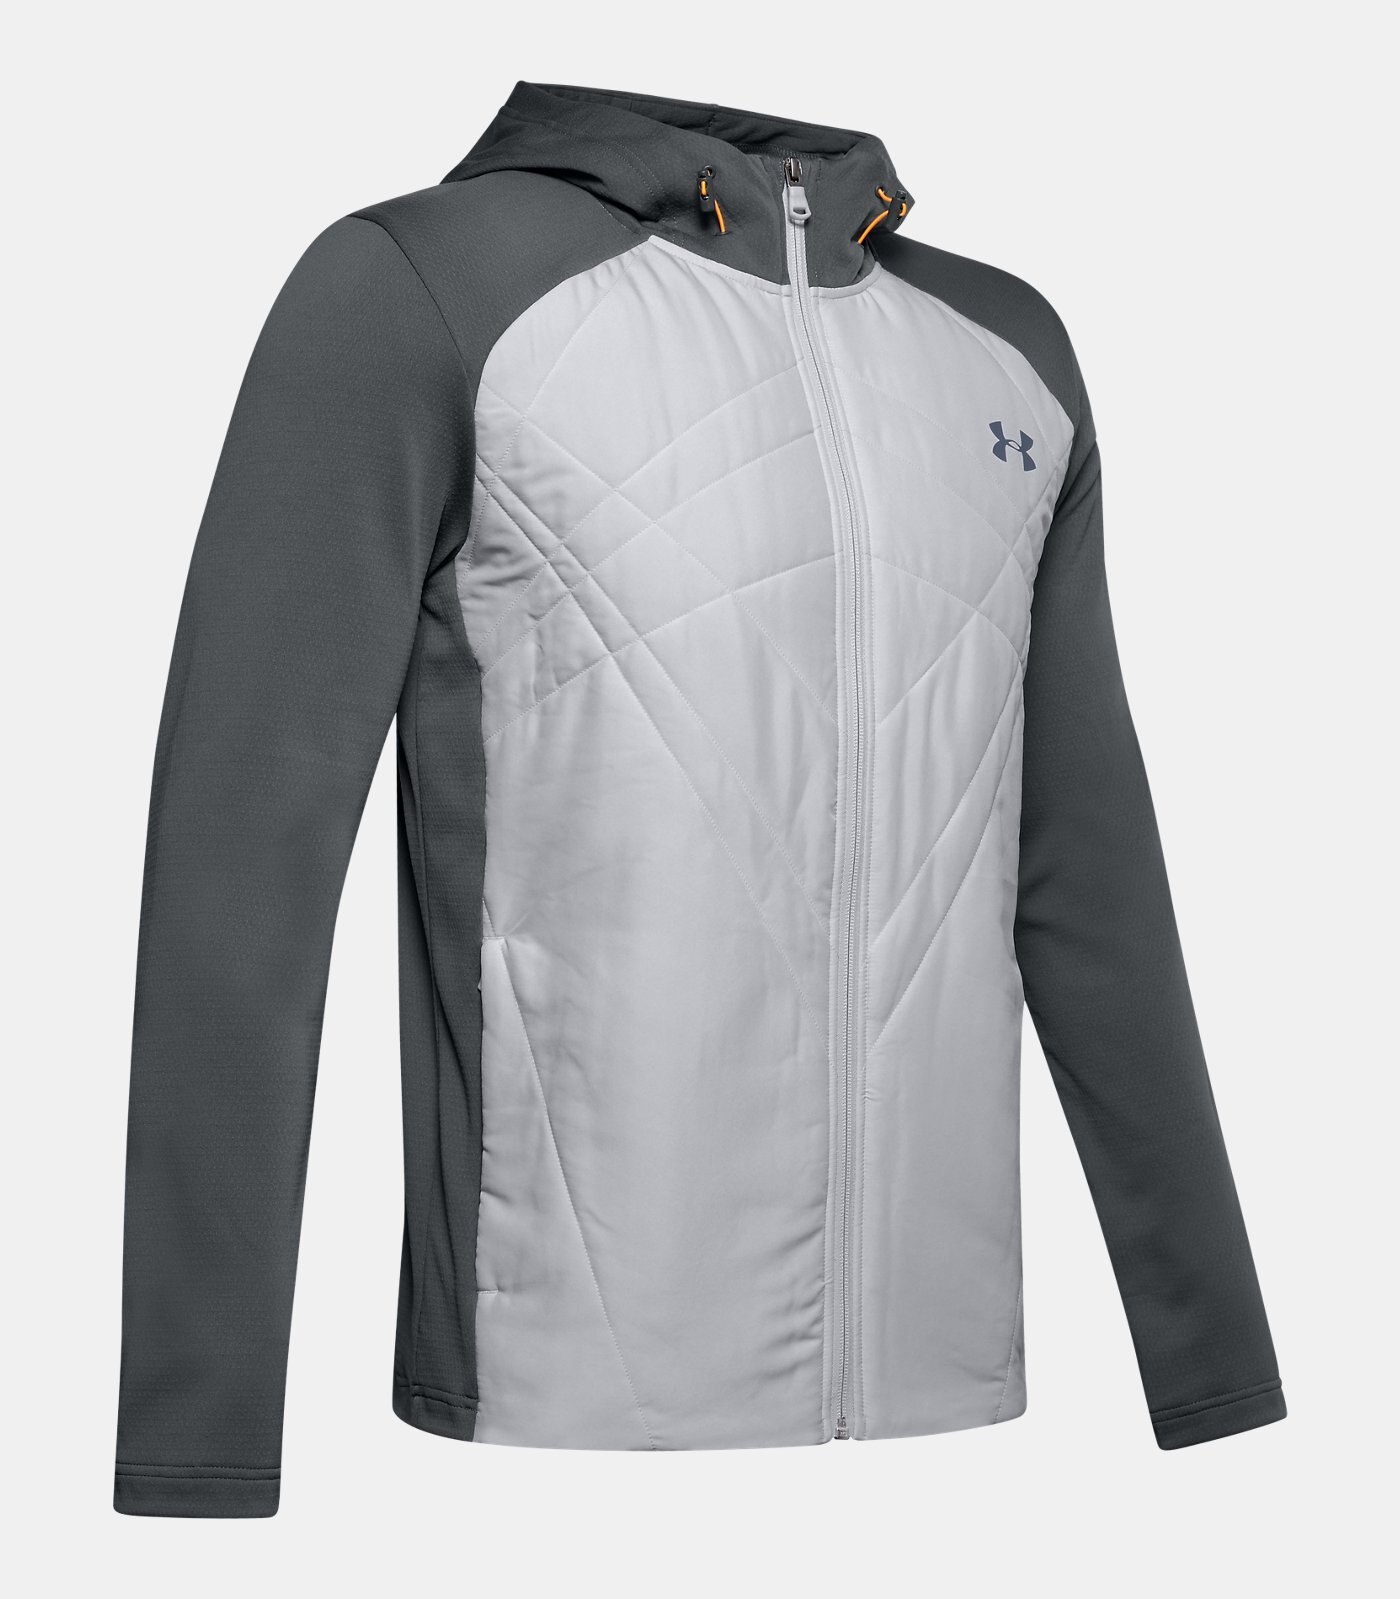 ColdGear Sprint Hybrid Jacket